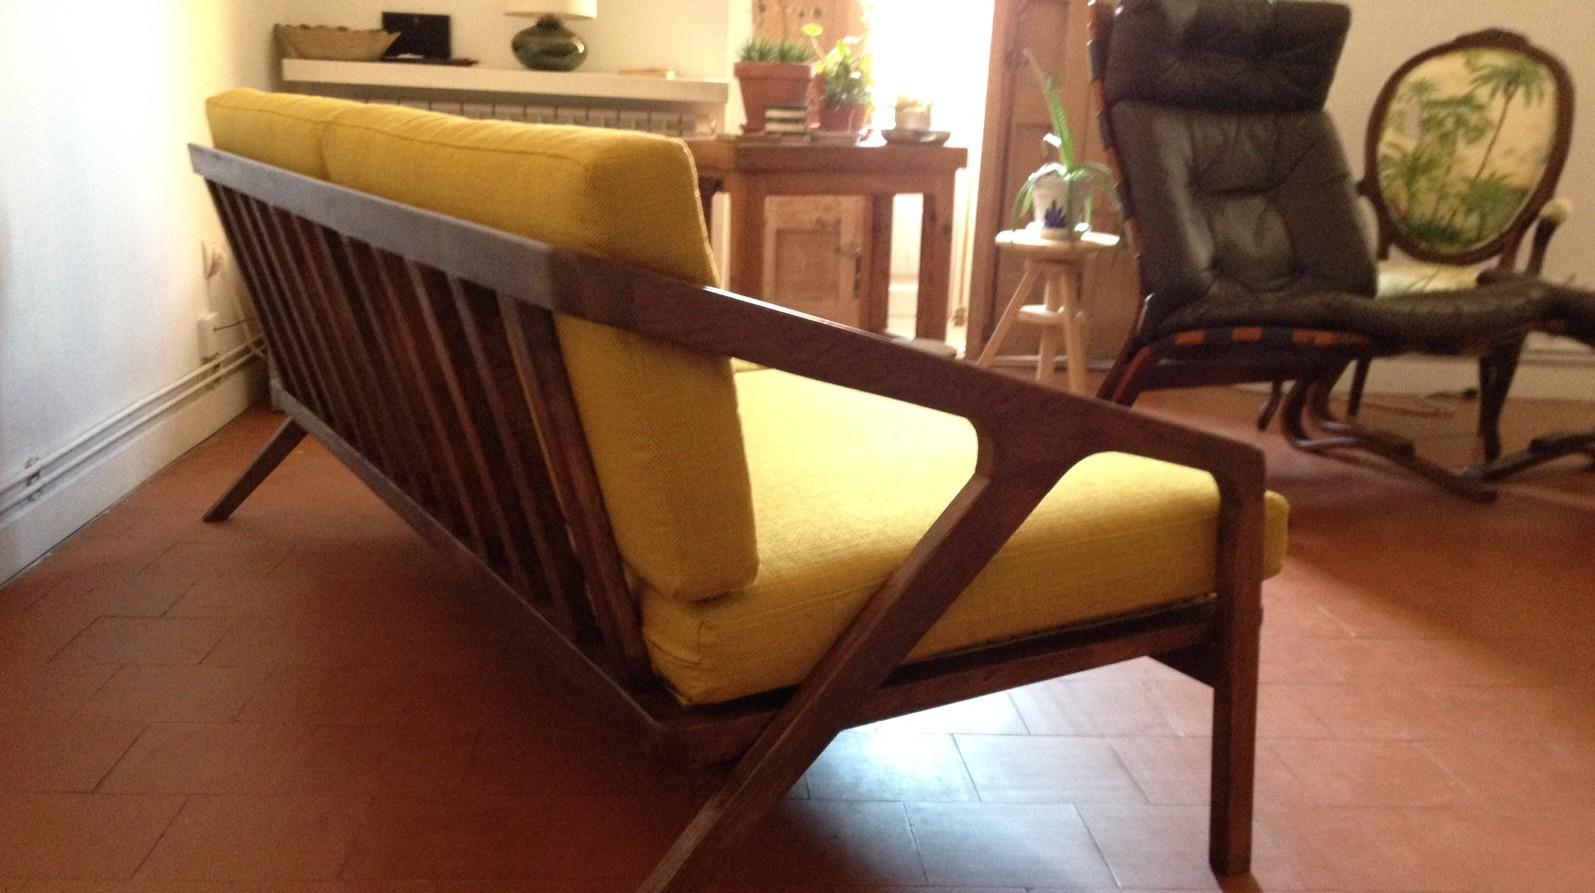 Muebles artesanos de madera maciza ebanisteria luengo - Ebanistas en barcelona ...